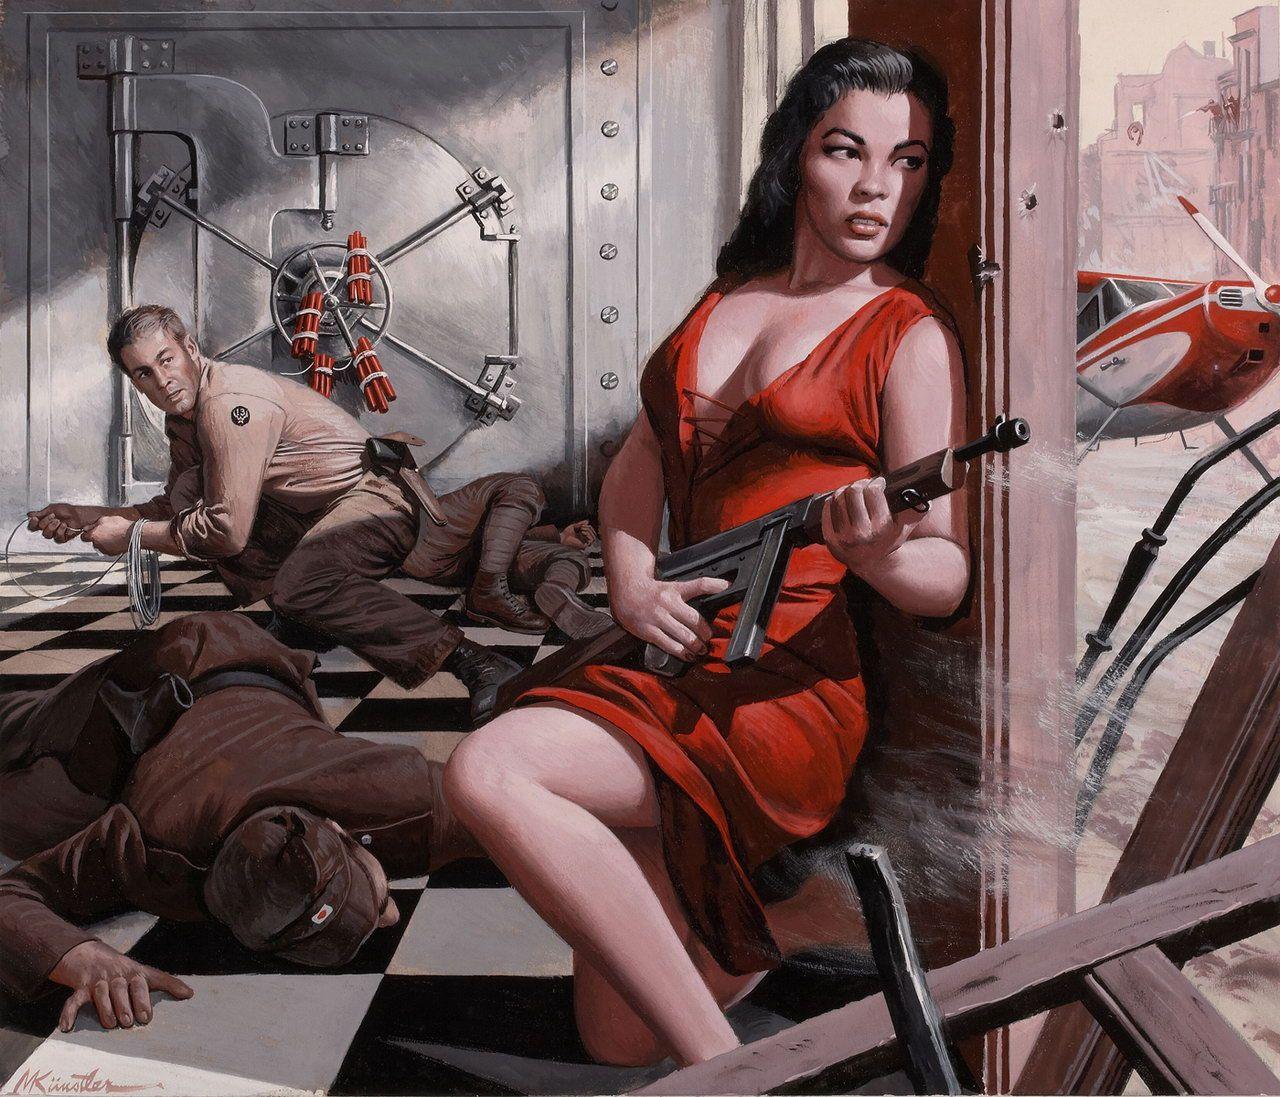 Иллюстрации Mort Kunstler